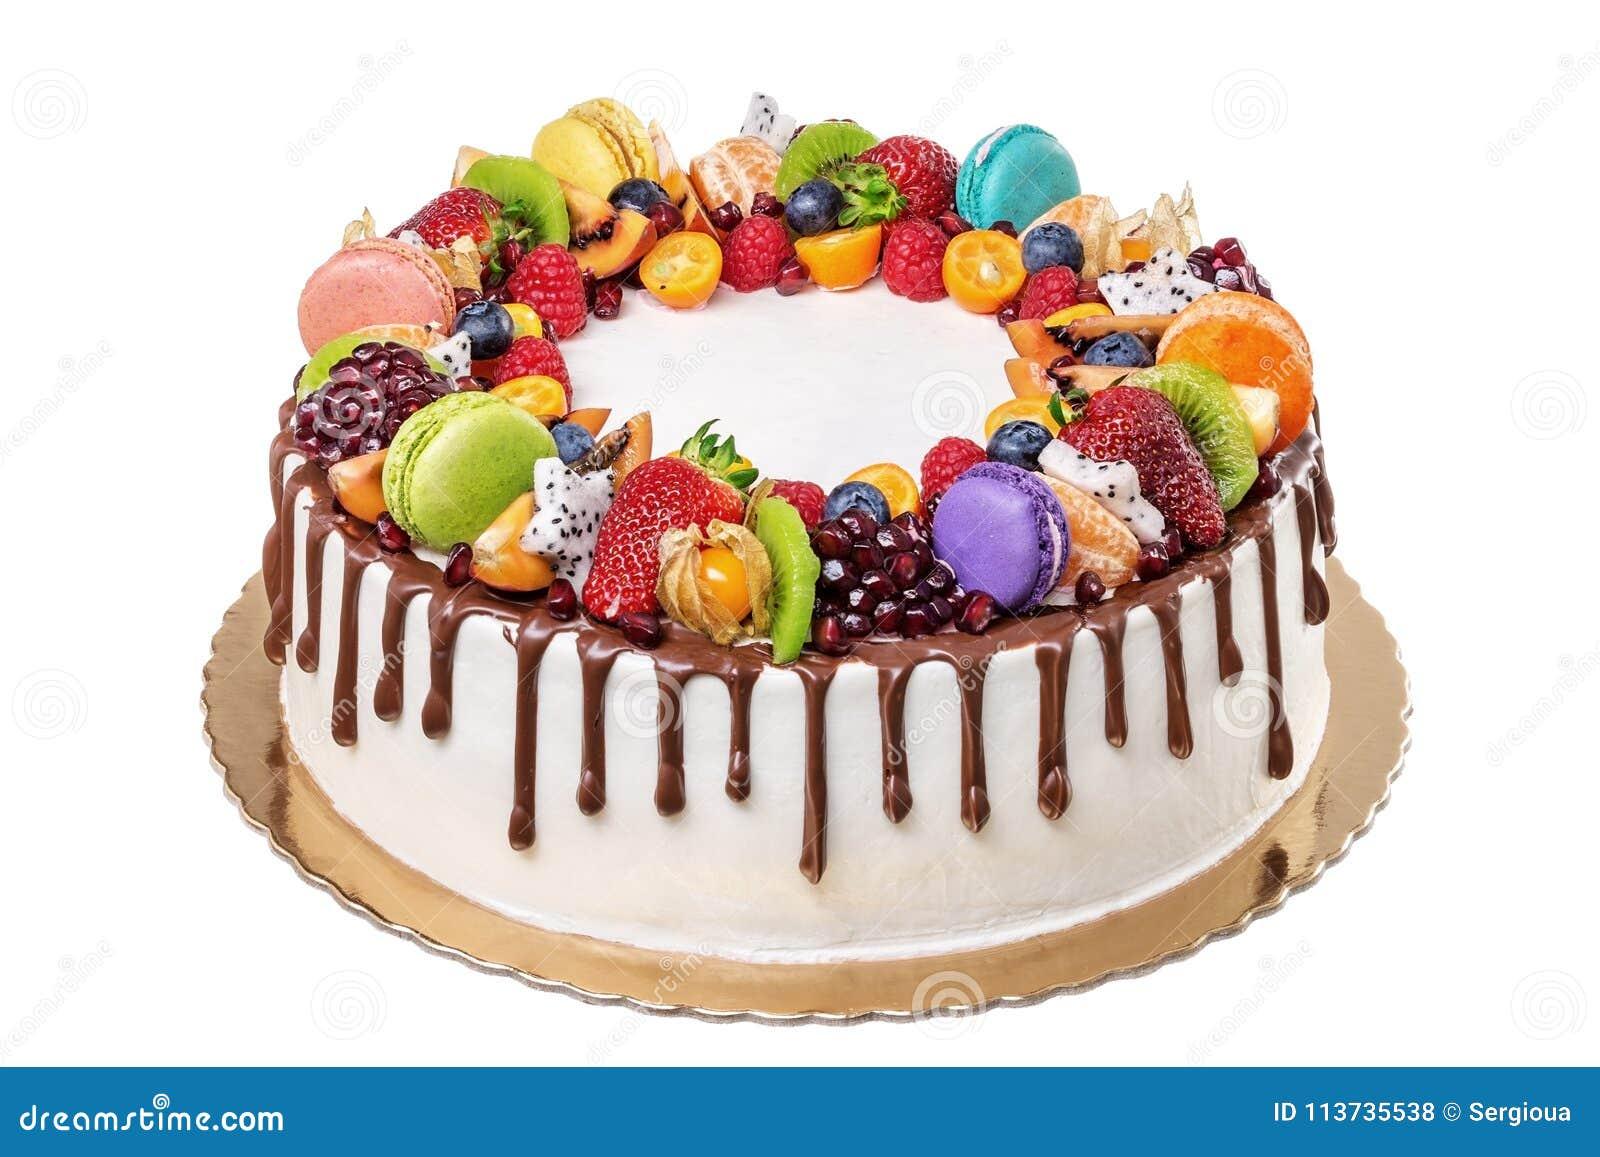 Stupendous Fruit Chocolate Birthday Cake On A White Background Stock Photo Funny Birthday Cards Online Overcheapnameinfo